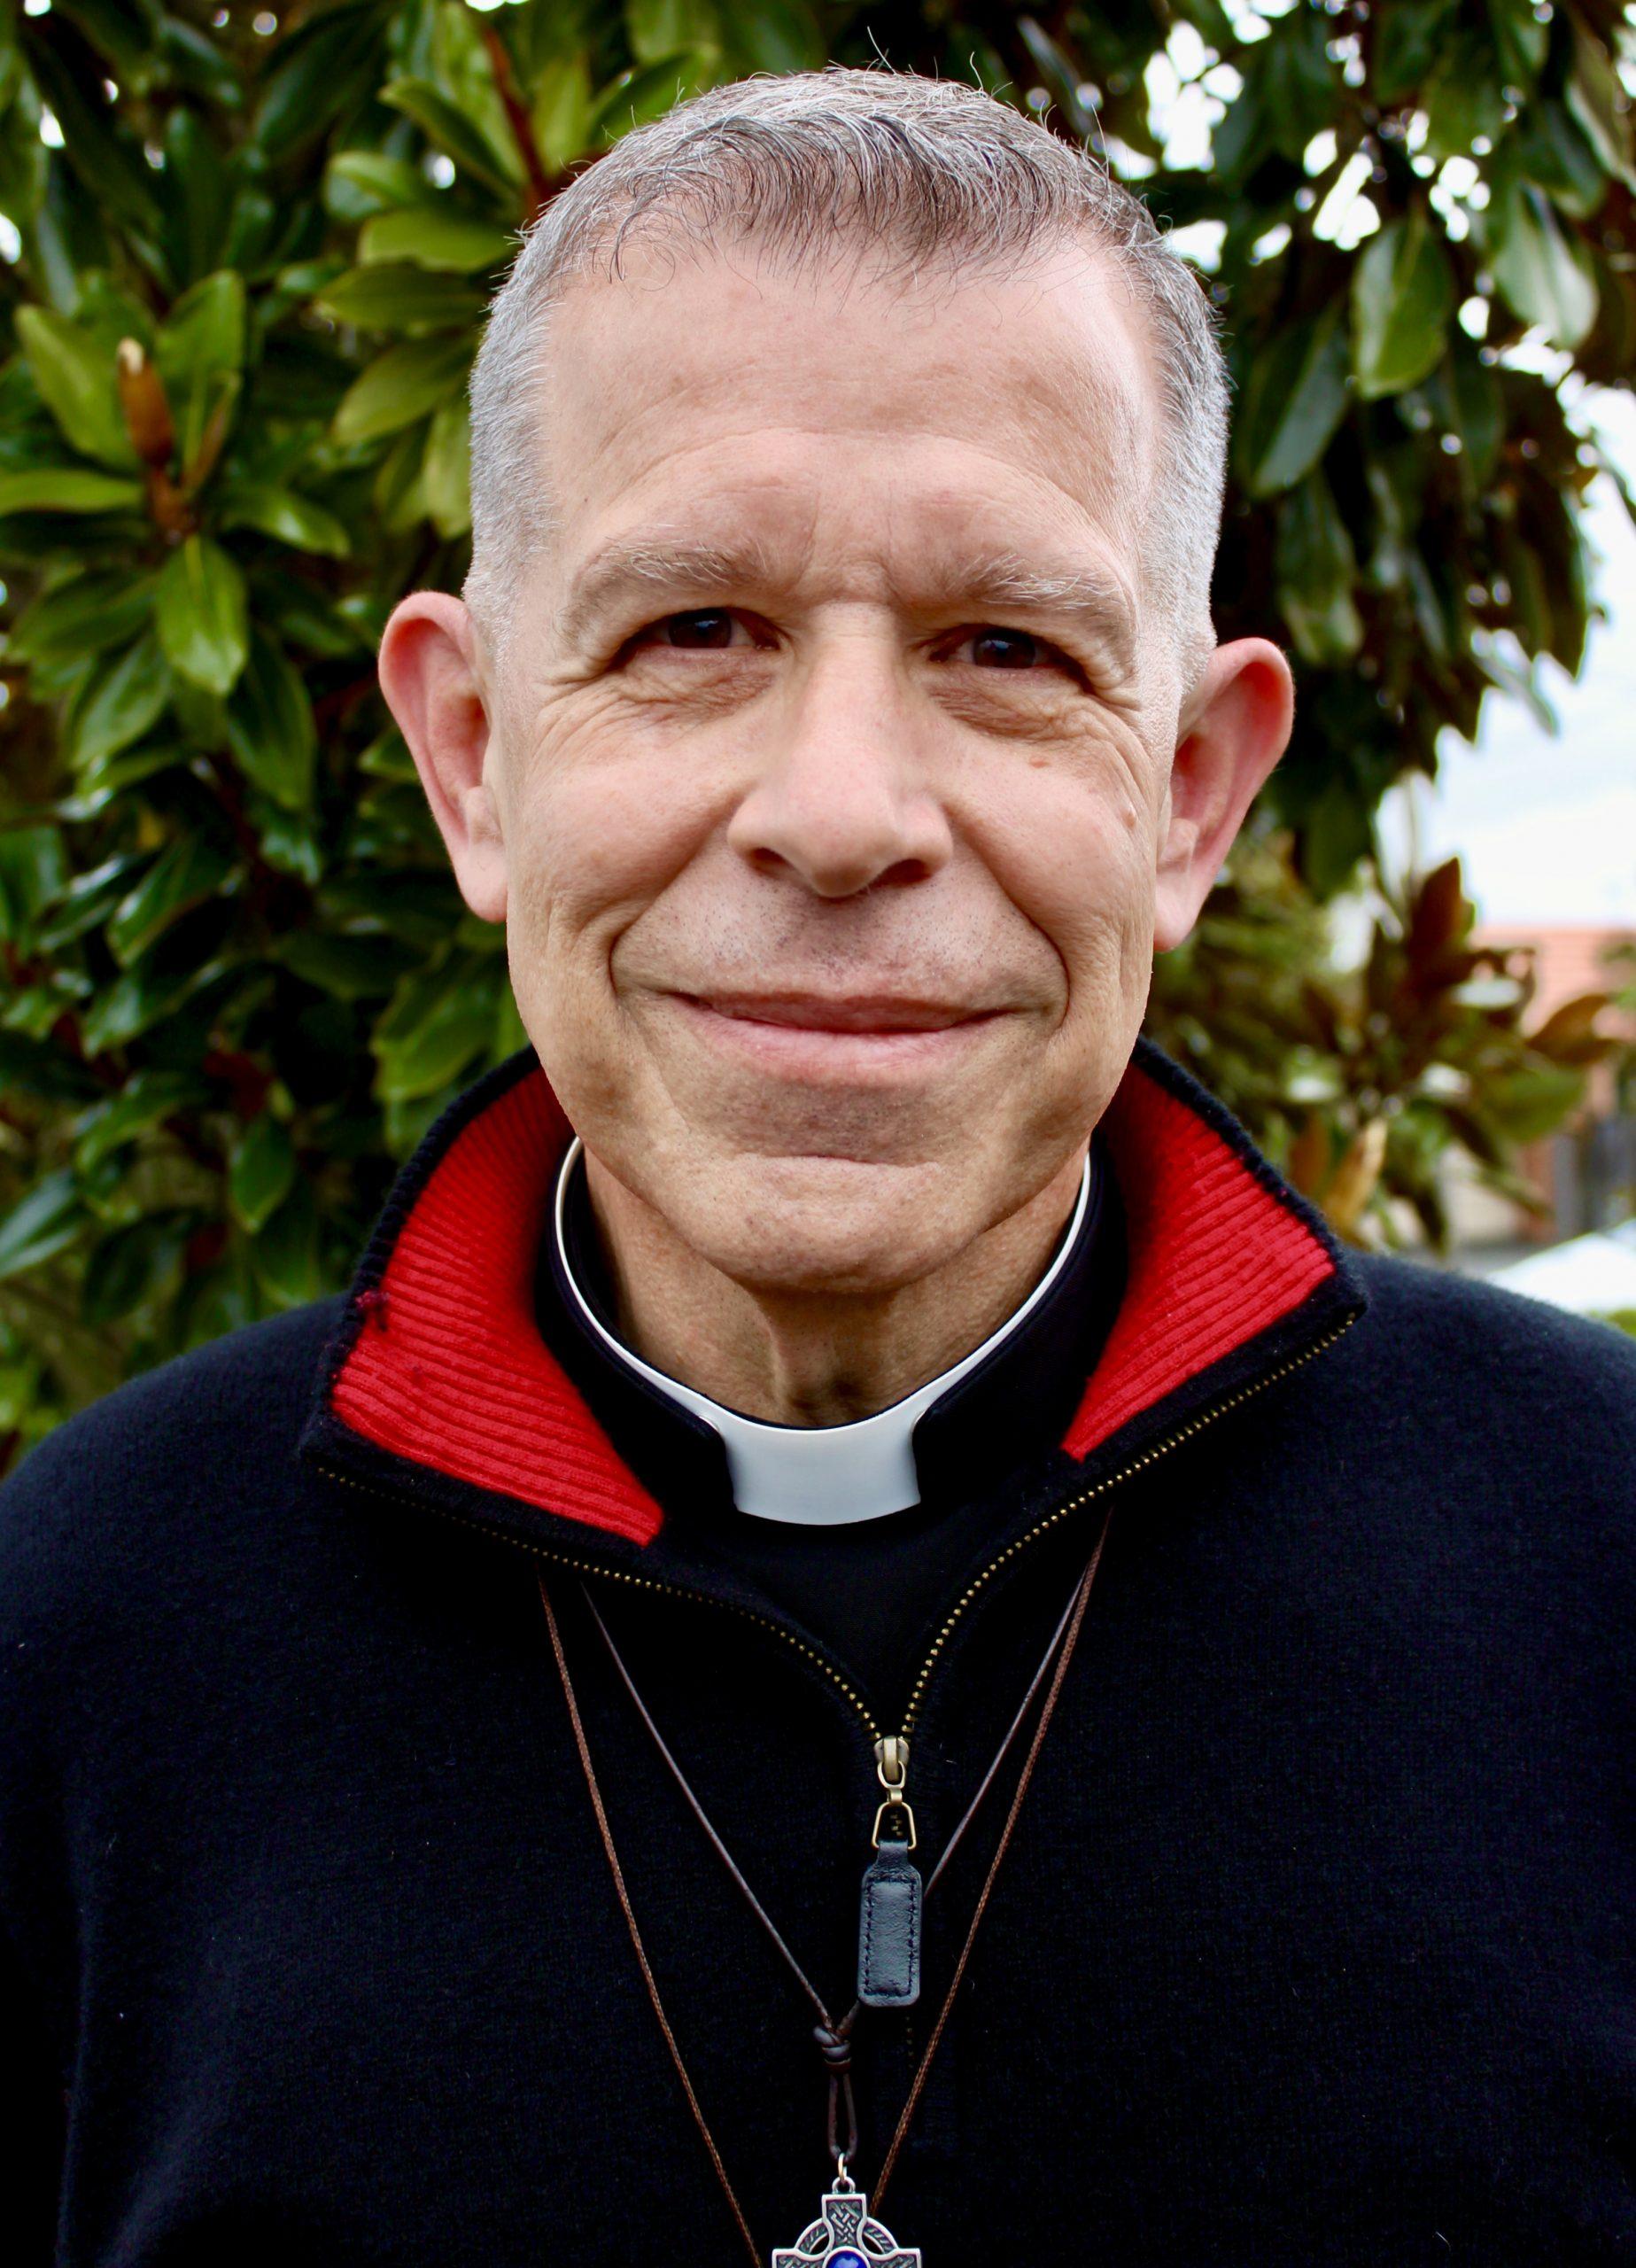 Rev Michael Brantley